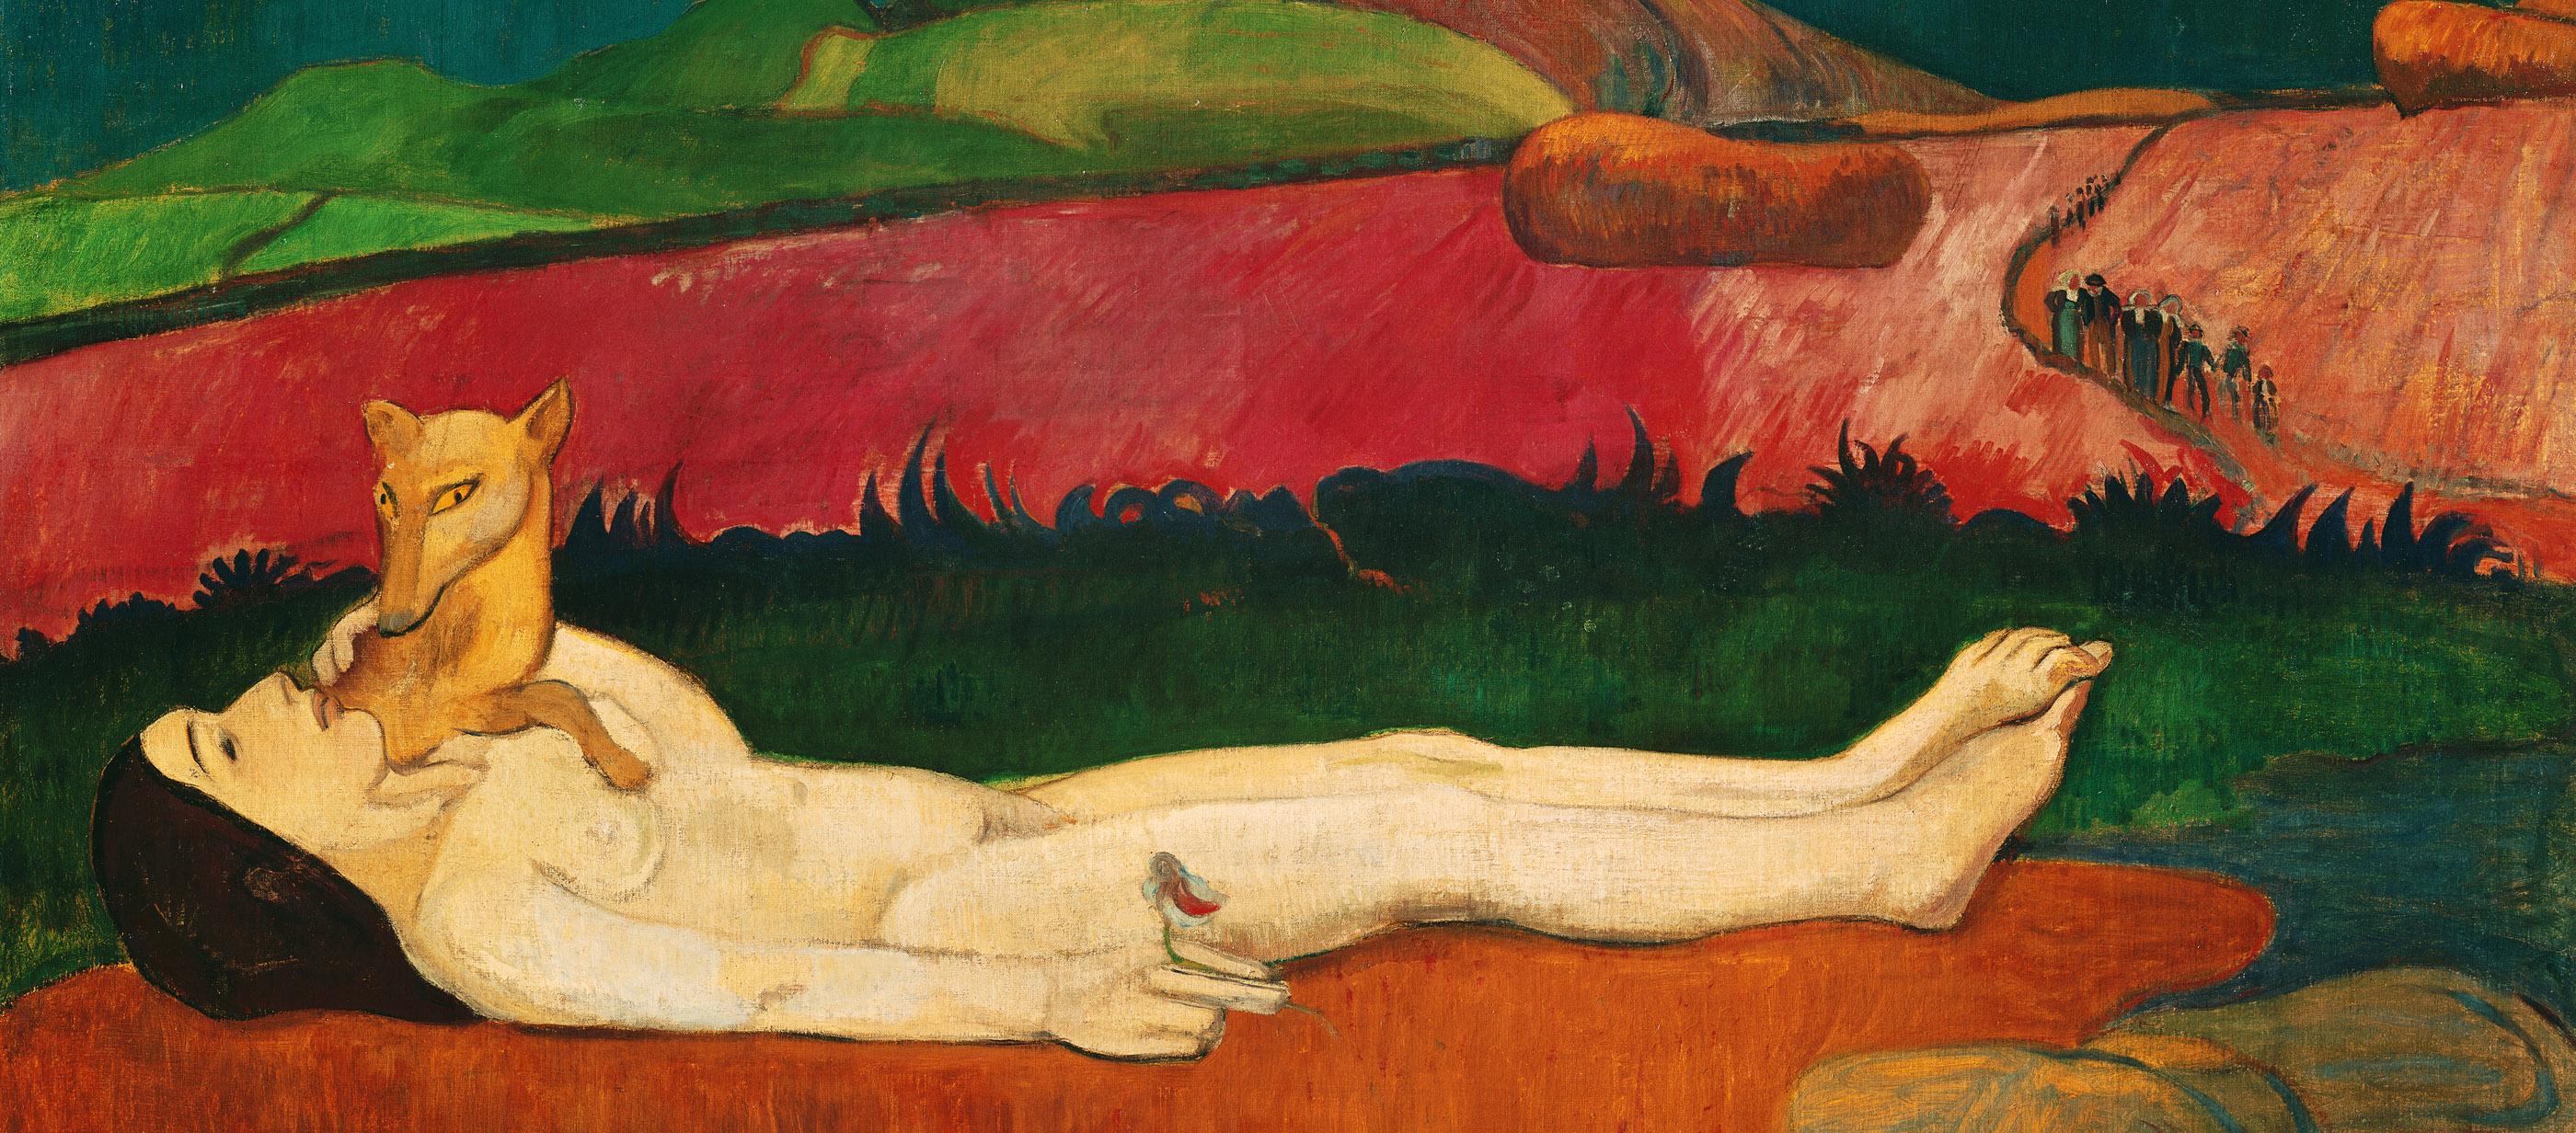 Loss of Virginity, by Paul Gauguin, 1890–1891.